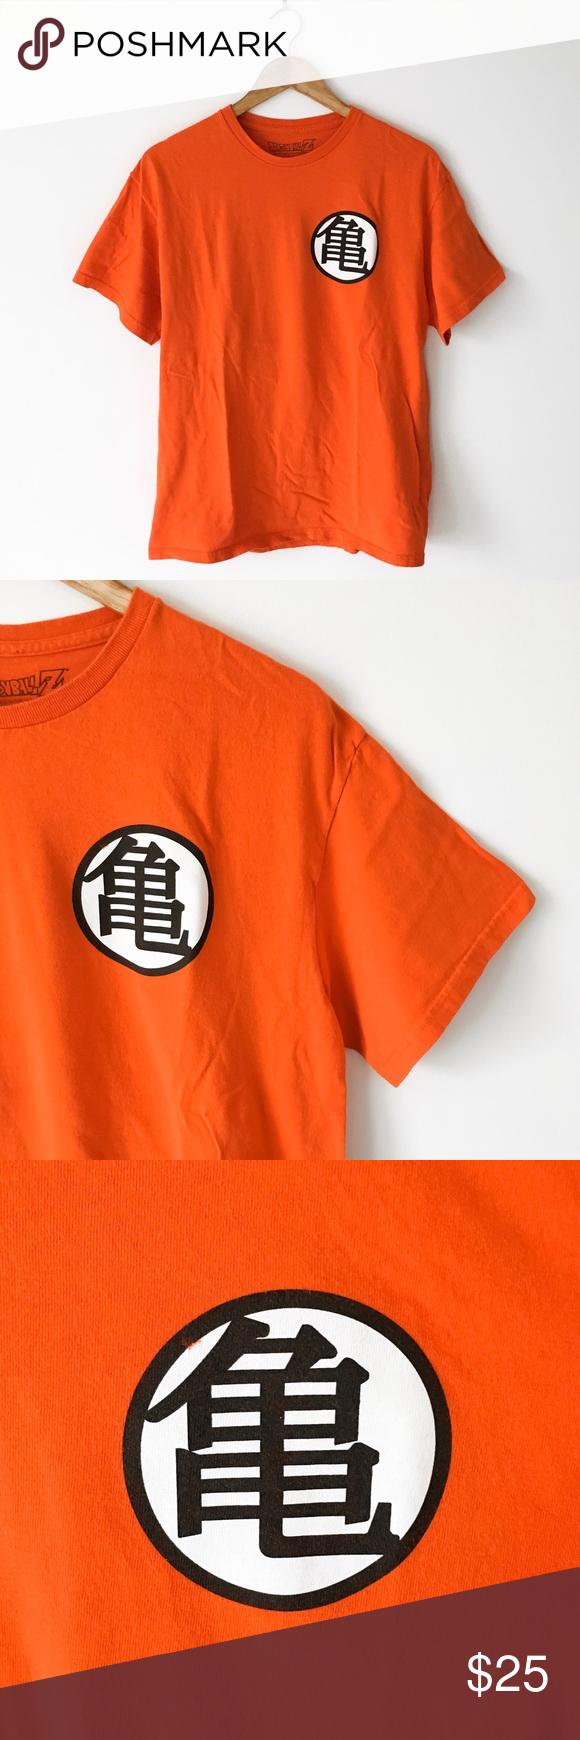 Official Dragon Ball Z Goku T Shirt Goku T Shirt Black And White Logos Retro 90s